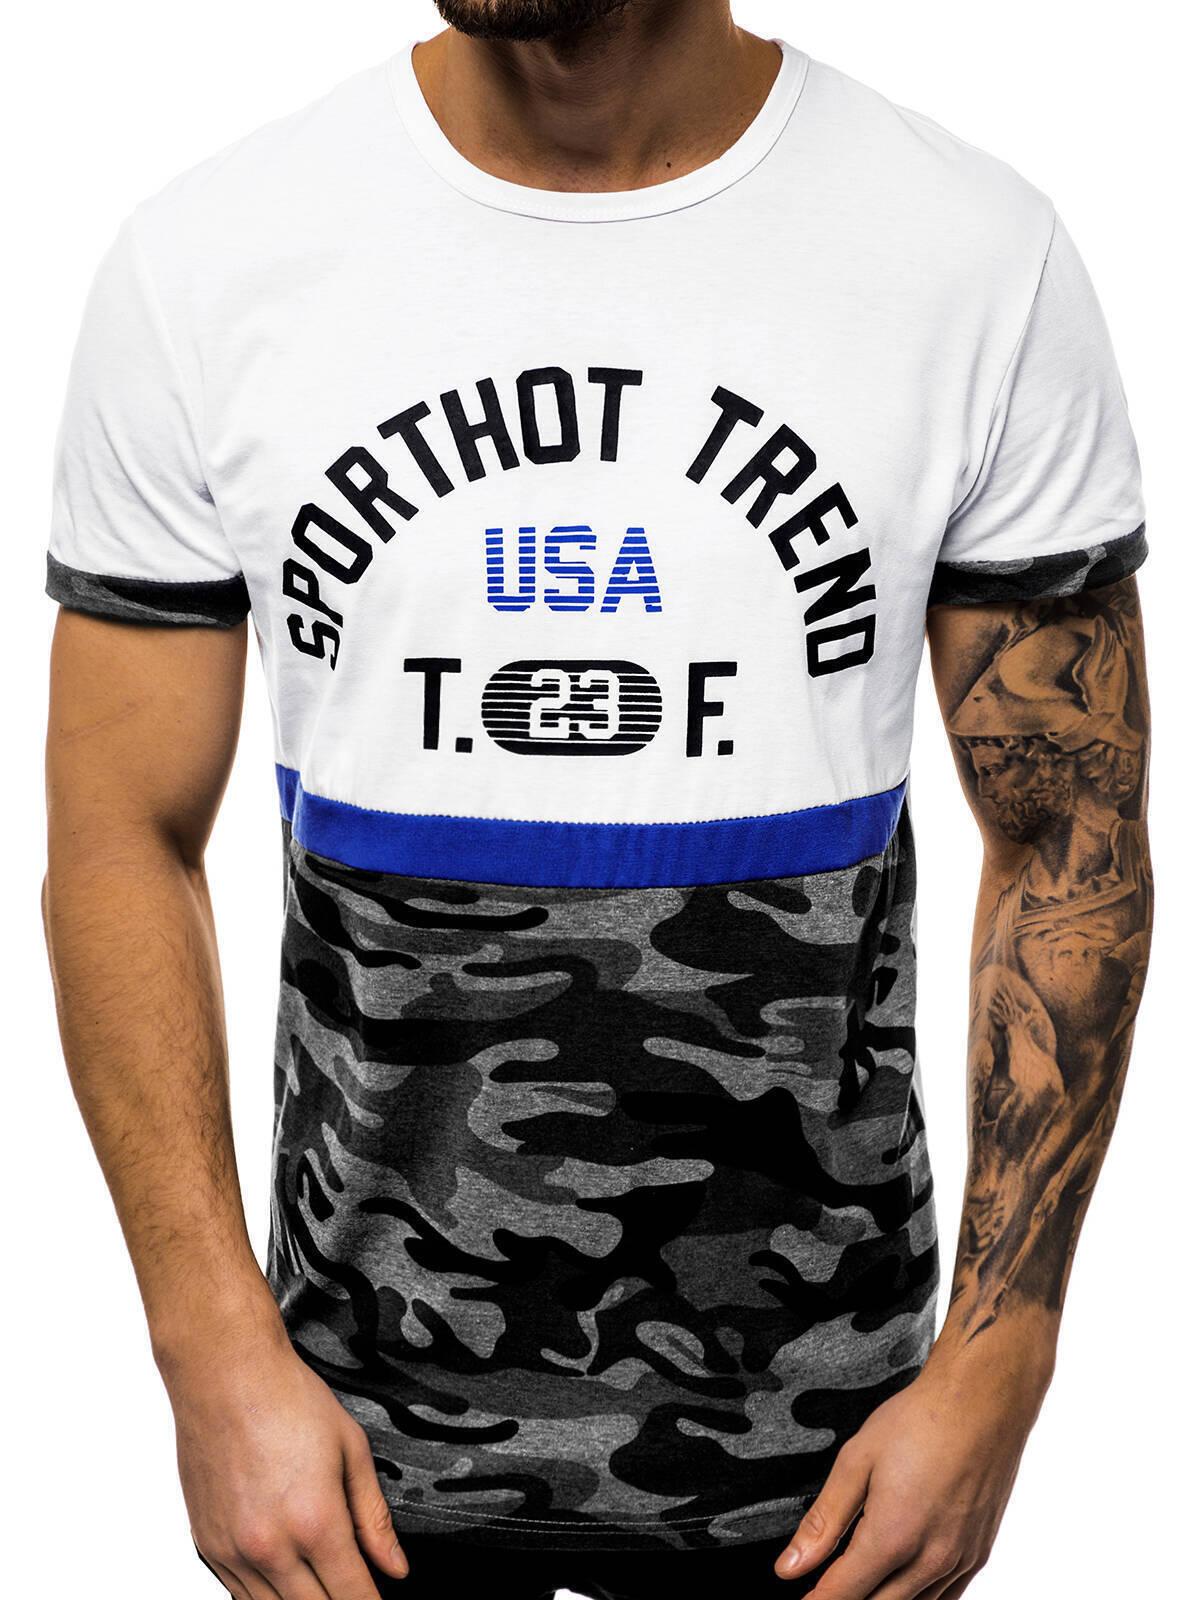 Indexbild 7 - T-Shirt Kurzarm Print Aufdruck Fitness Jogging Sport Shirt Herren OZONEE 12511